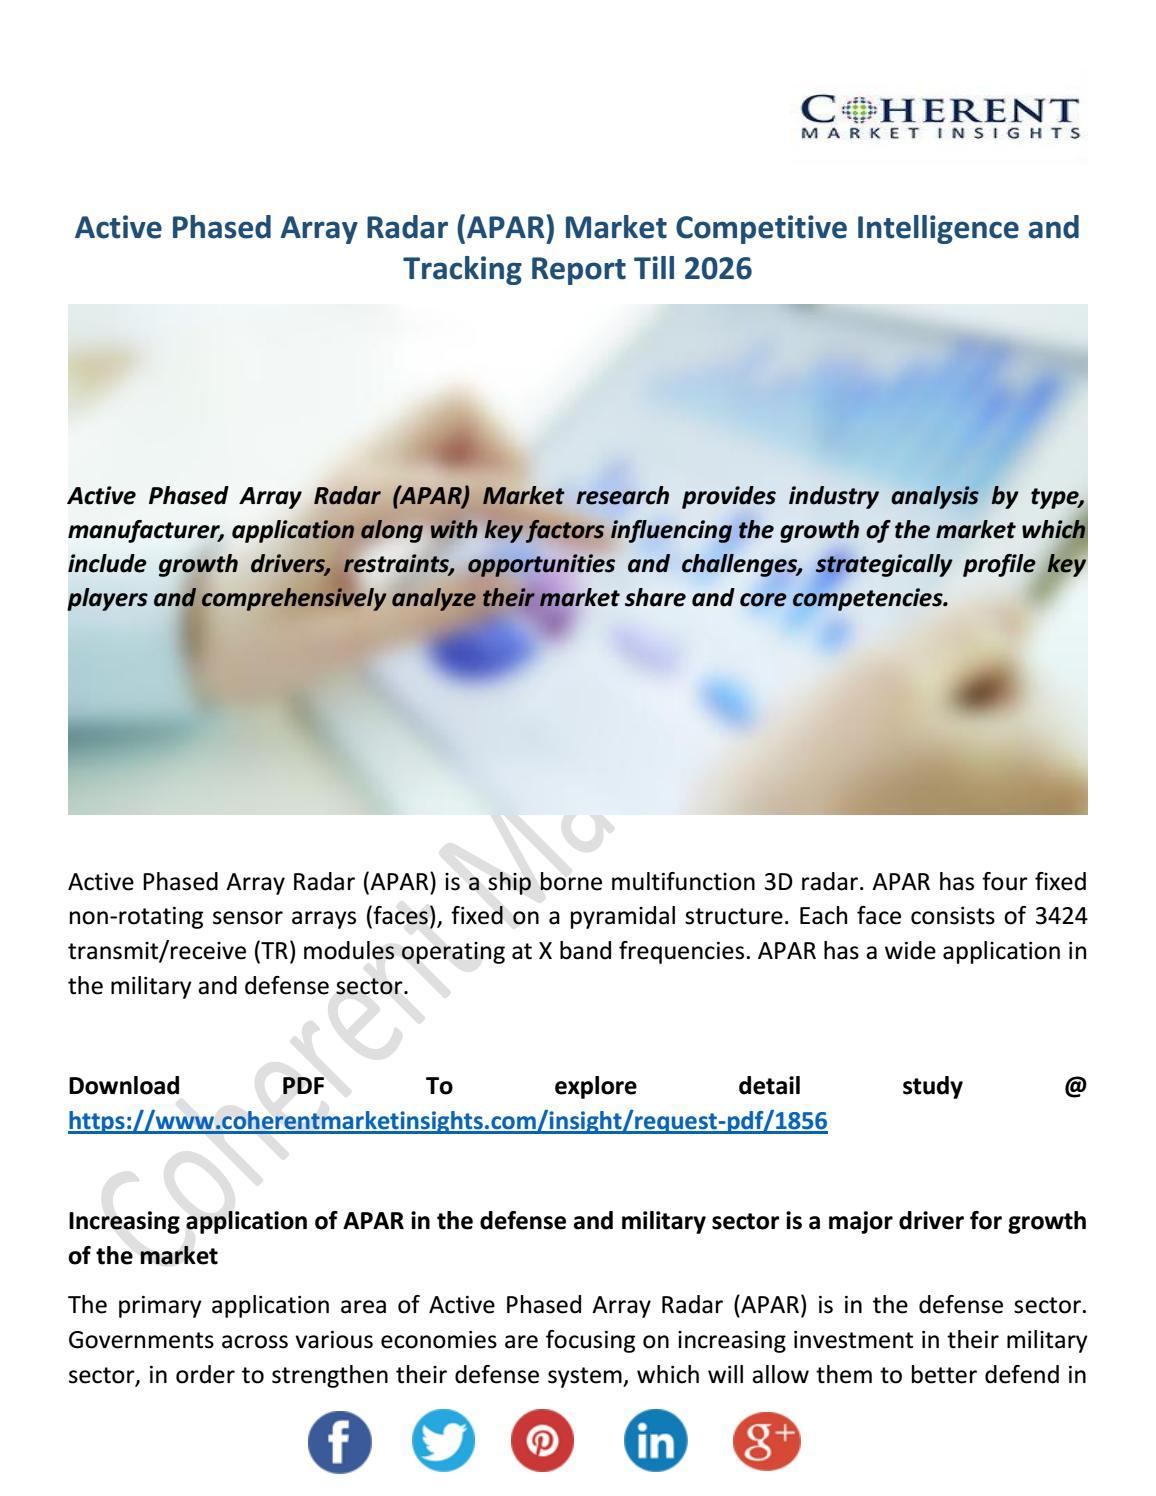 Active Phased Array Radar (APAR) Market by EmmaStevens - issuu